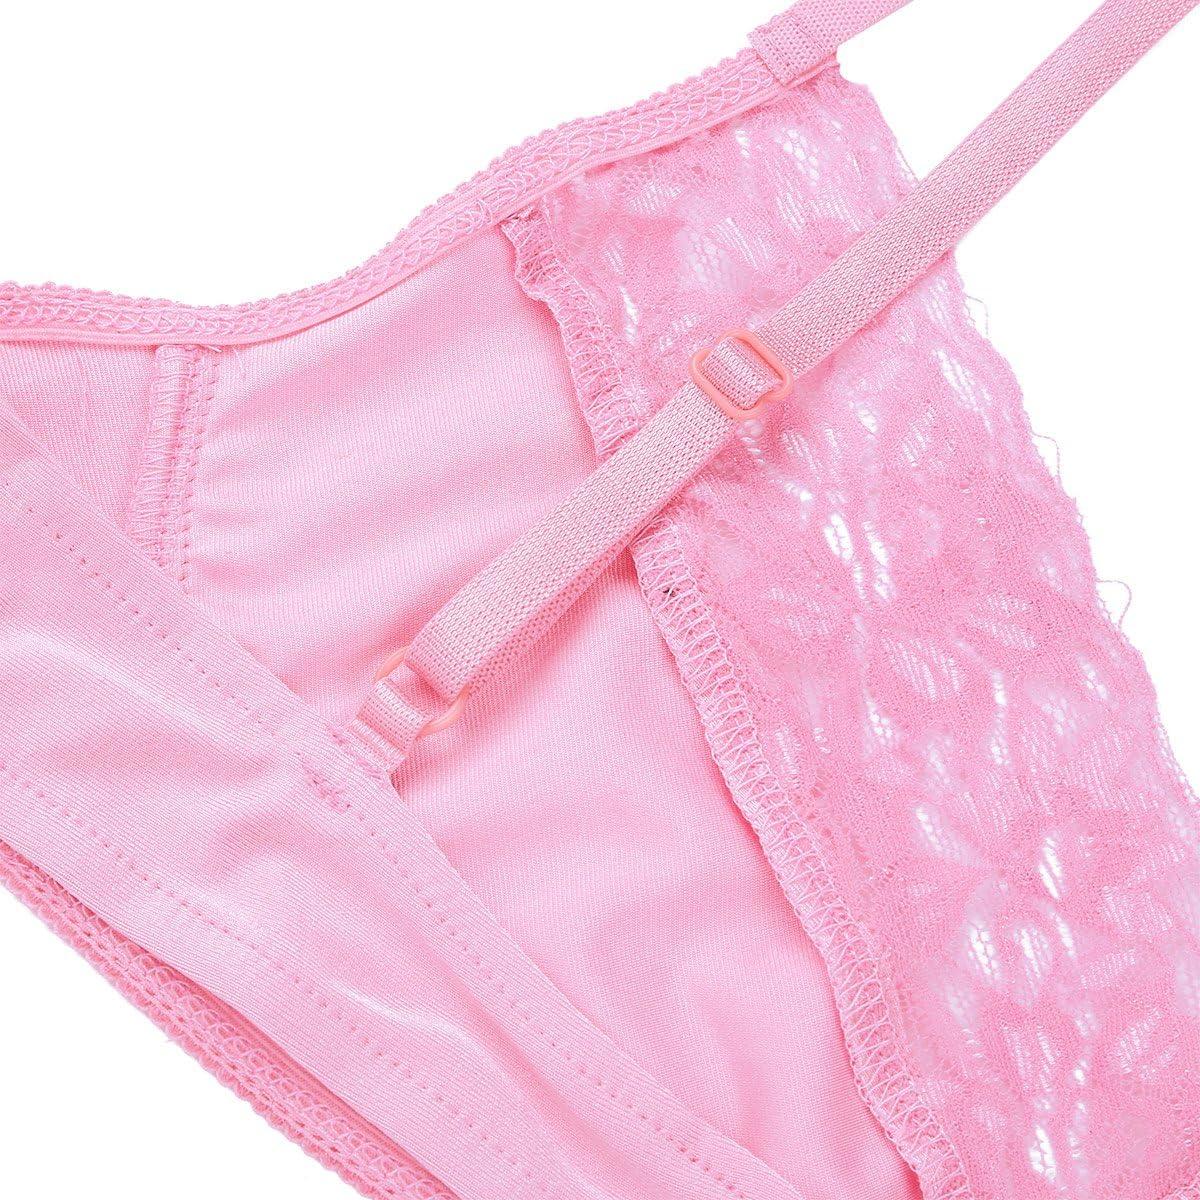 Agoky Sujetador Hombre Encaje Lencer/ía Adulto Ropa Interior Sissy Atractivo Chico Ropa de Dormir Bikini Tops Er/ótica Sensual para Noche Negro//Rosa